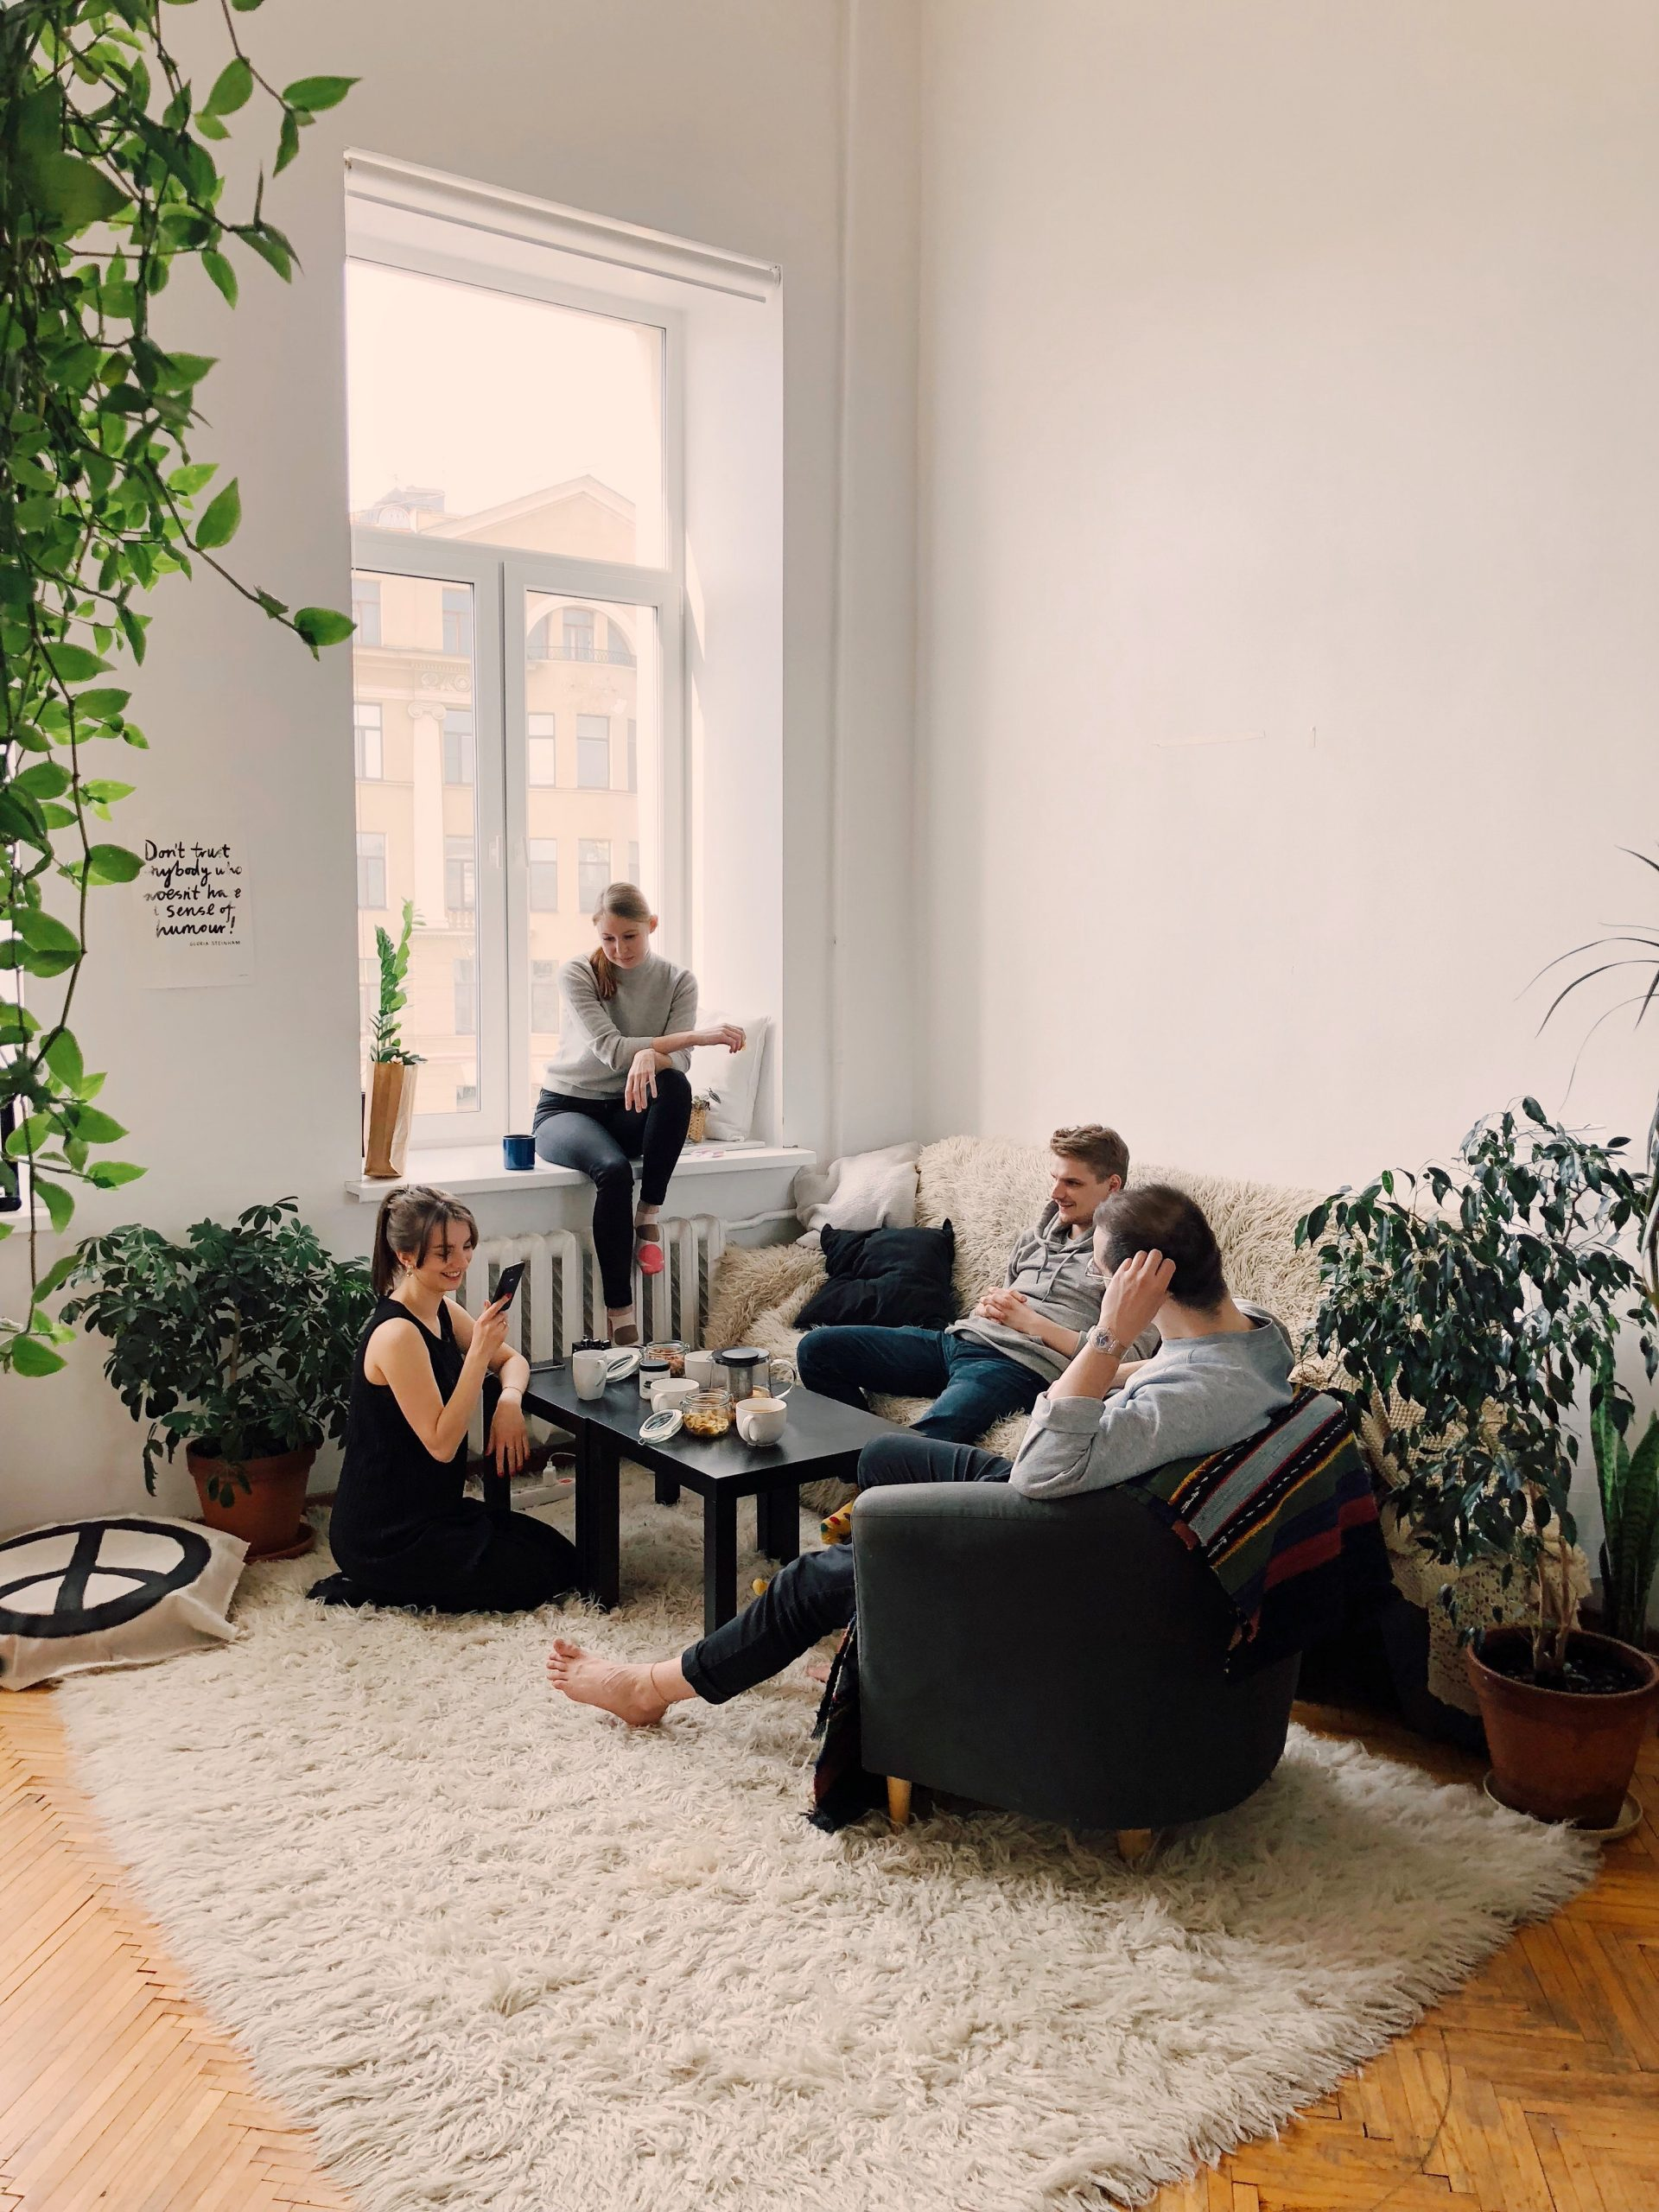 people-gathered-inside-house-sitting-on-sofa-1054974